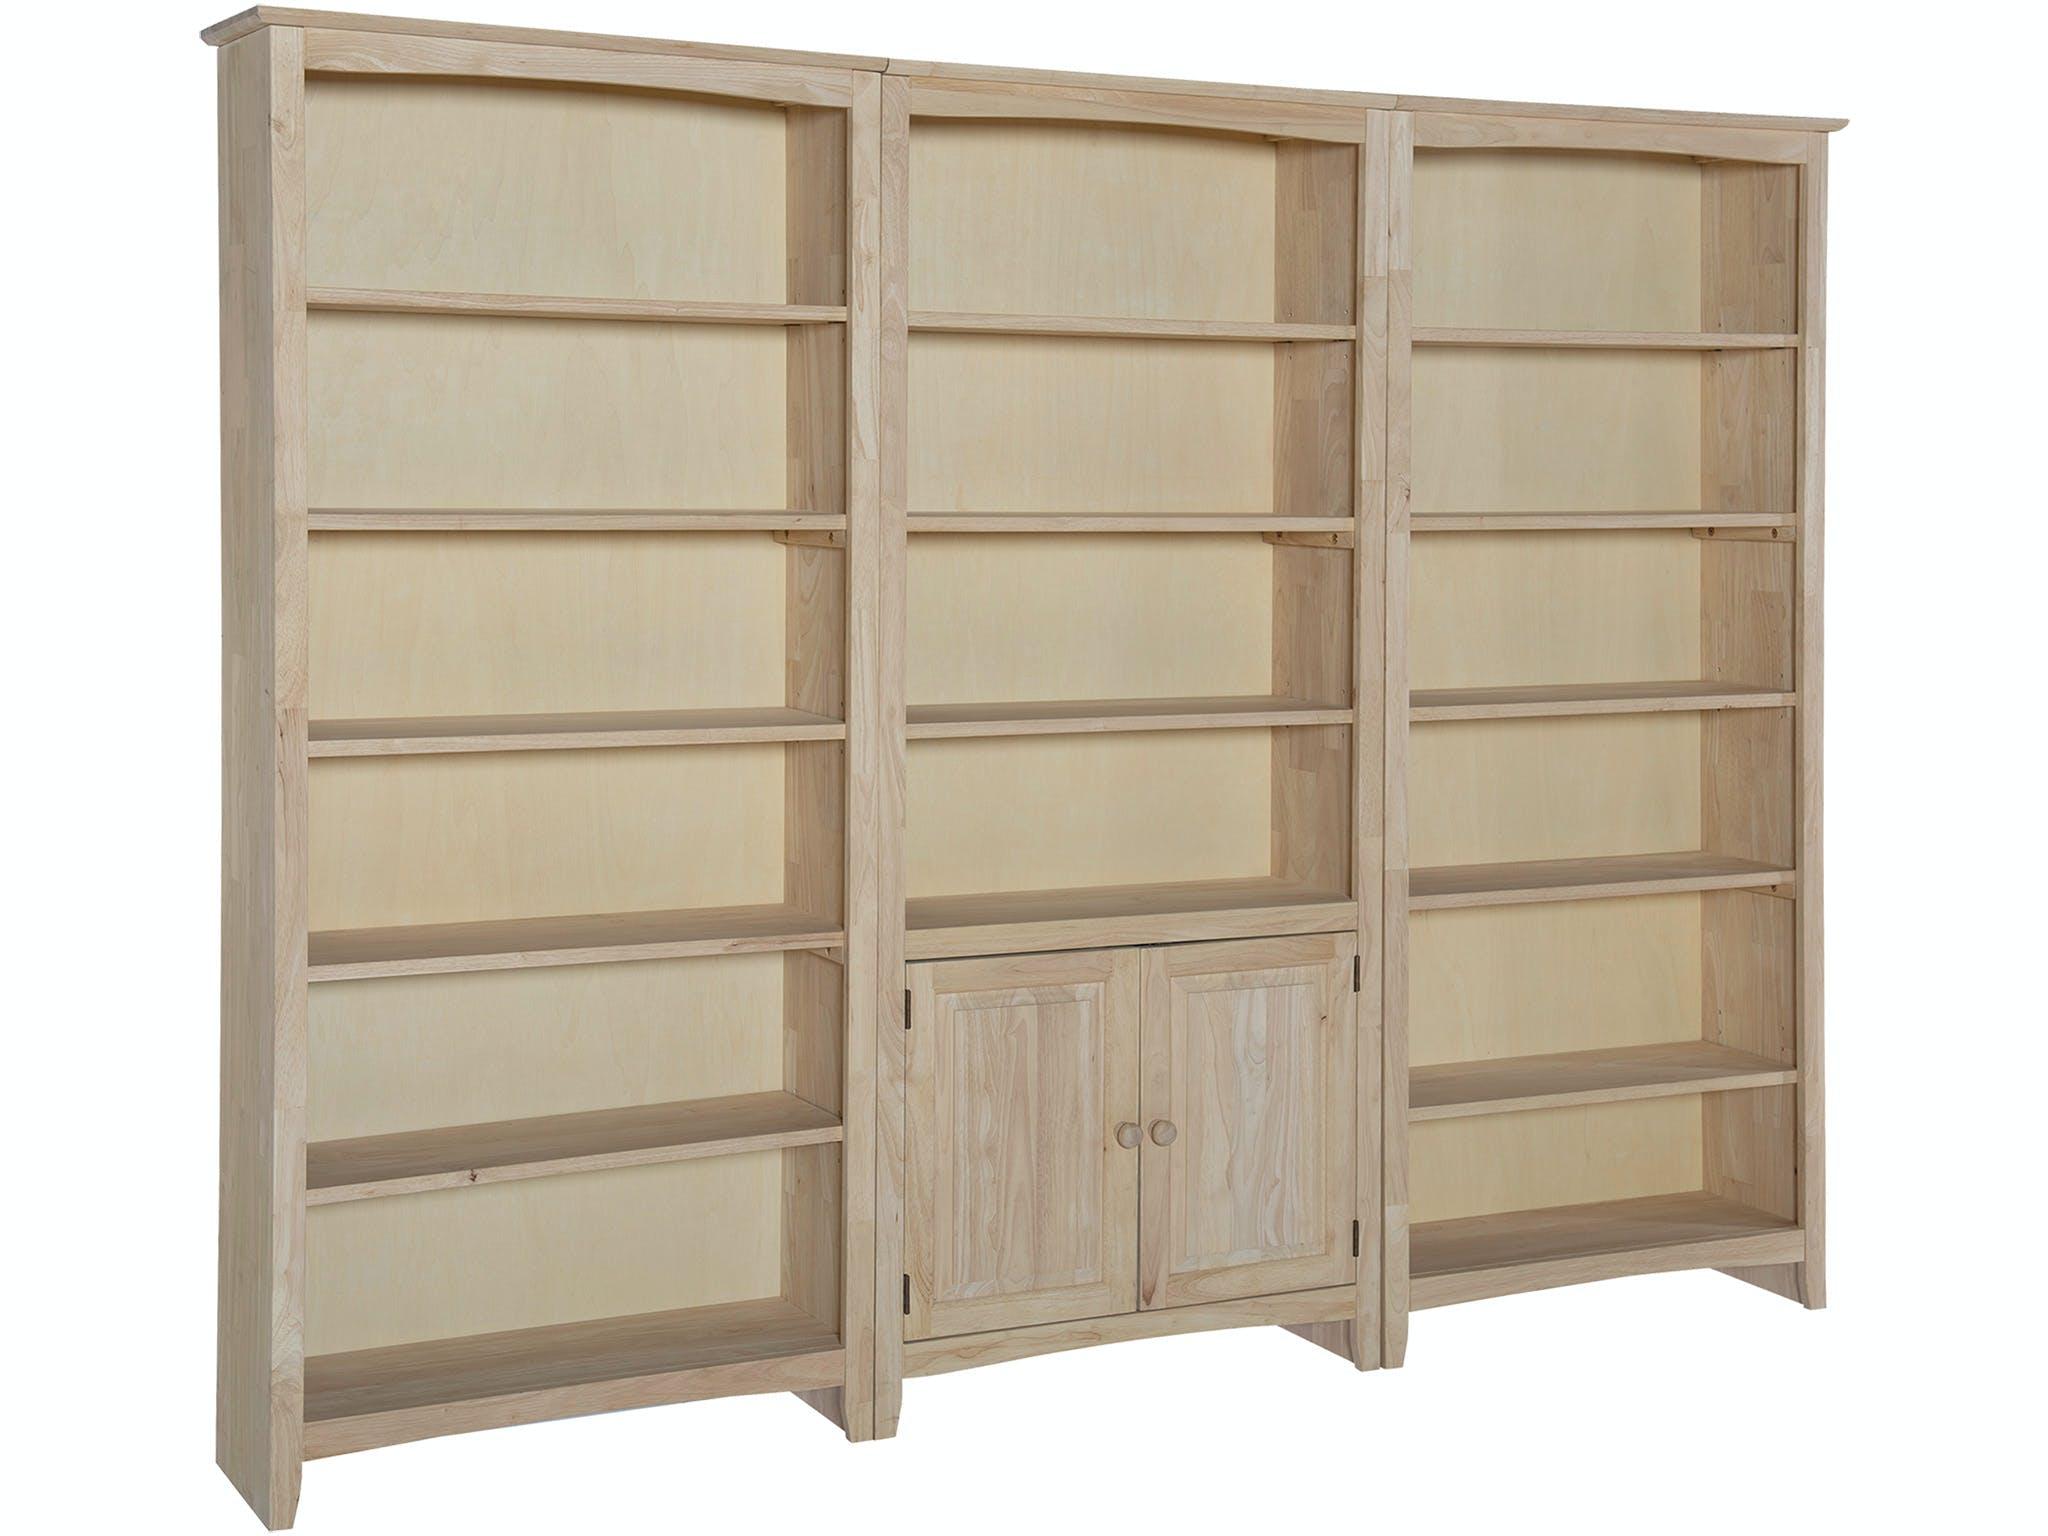 John Thomas Home Office 72 Inch High Bookshelf X3 Bookshelf Units With Pair Of Bookcase Doors